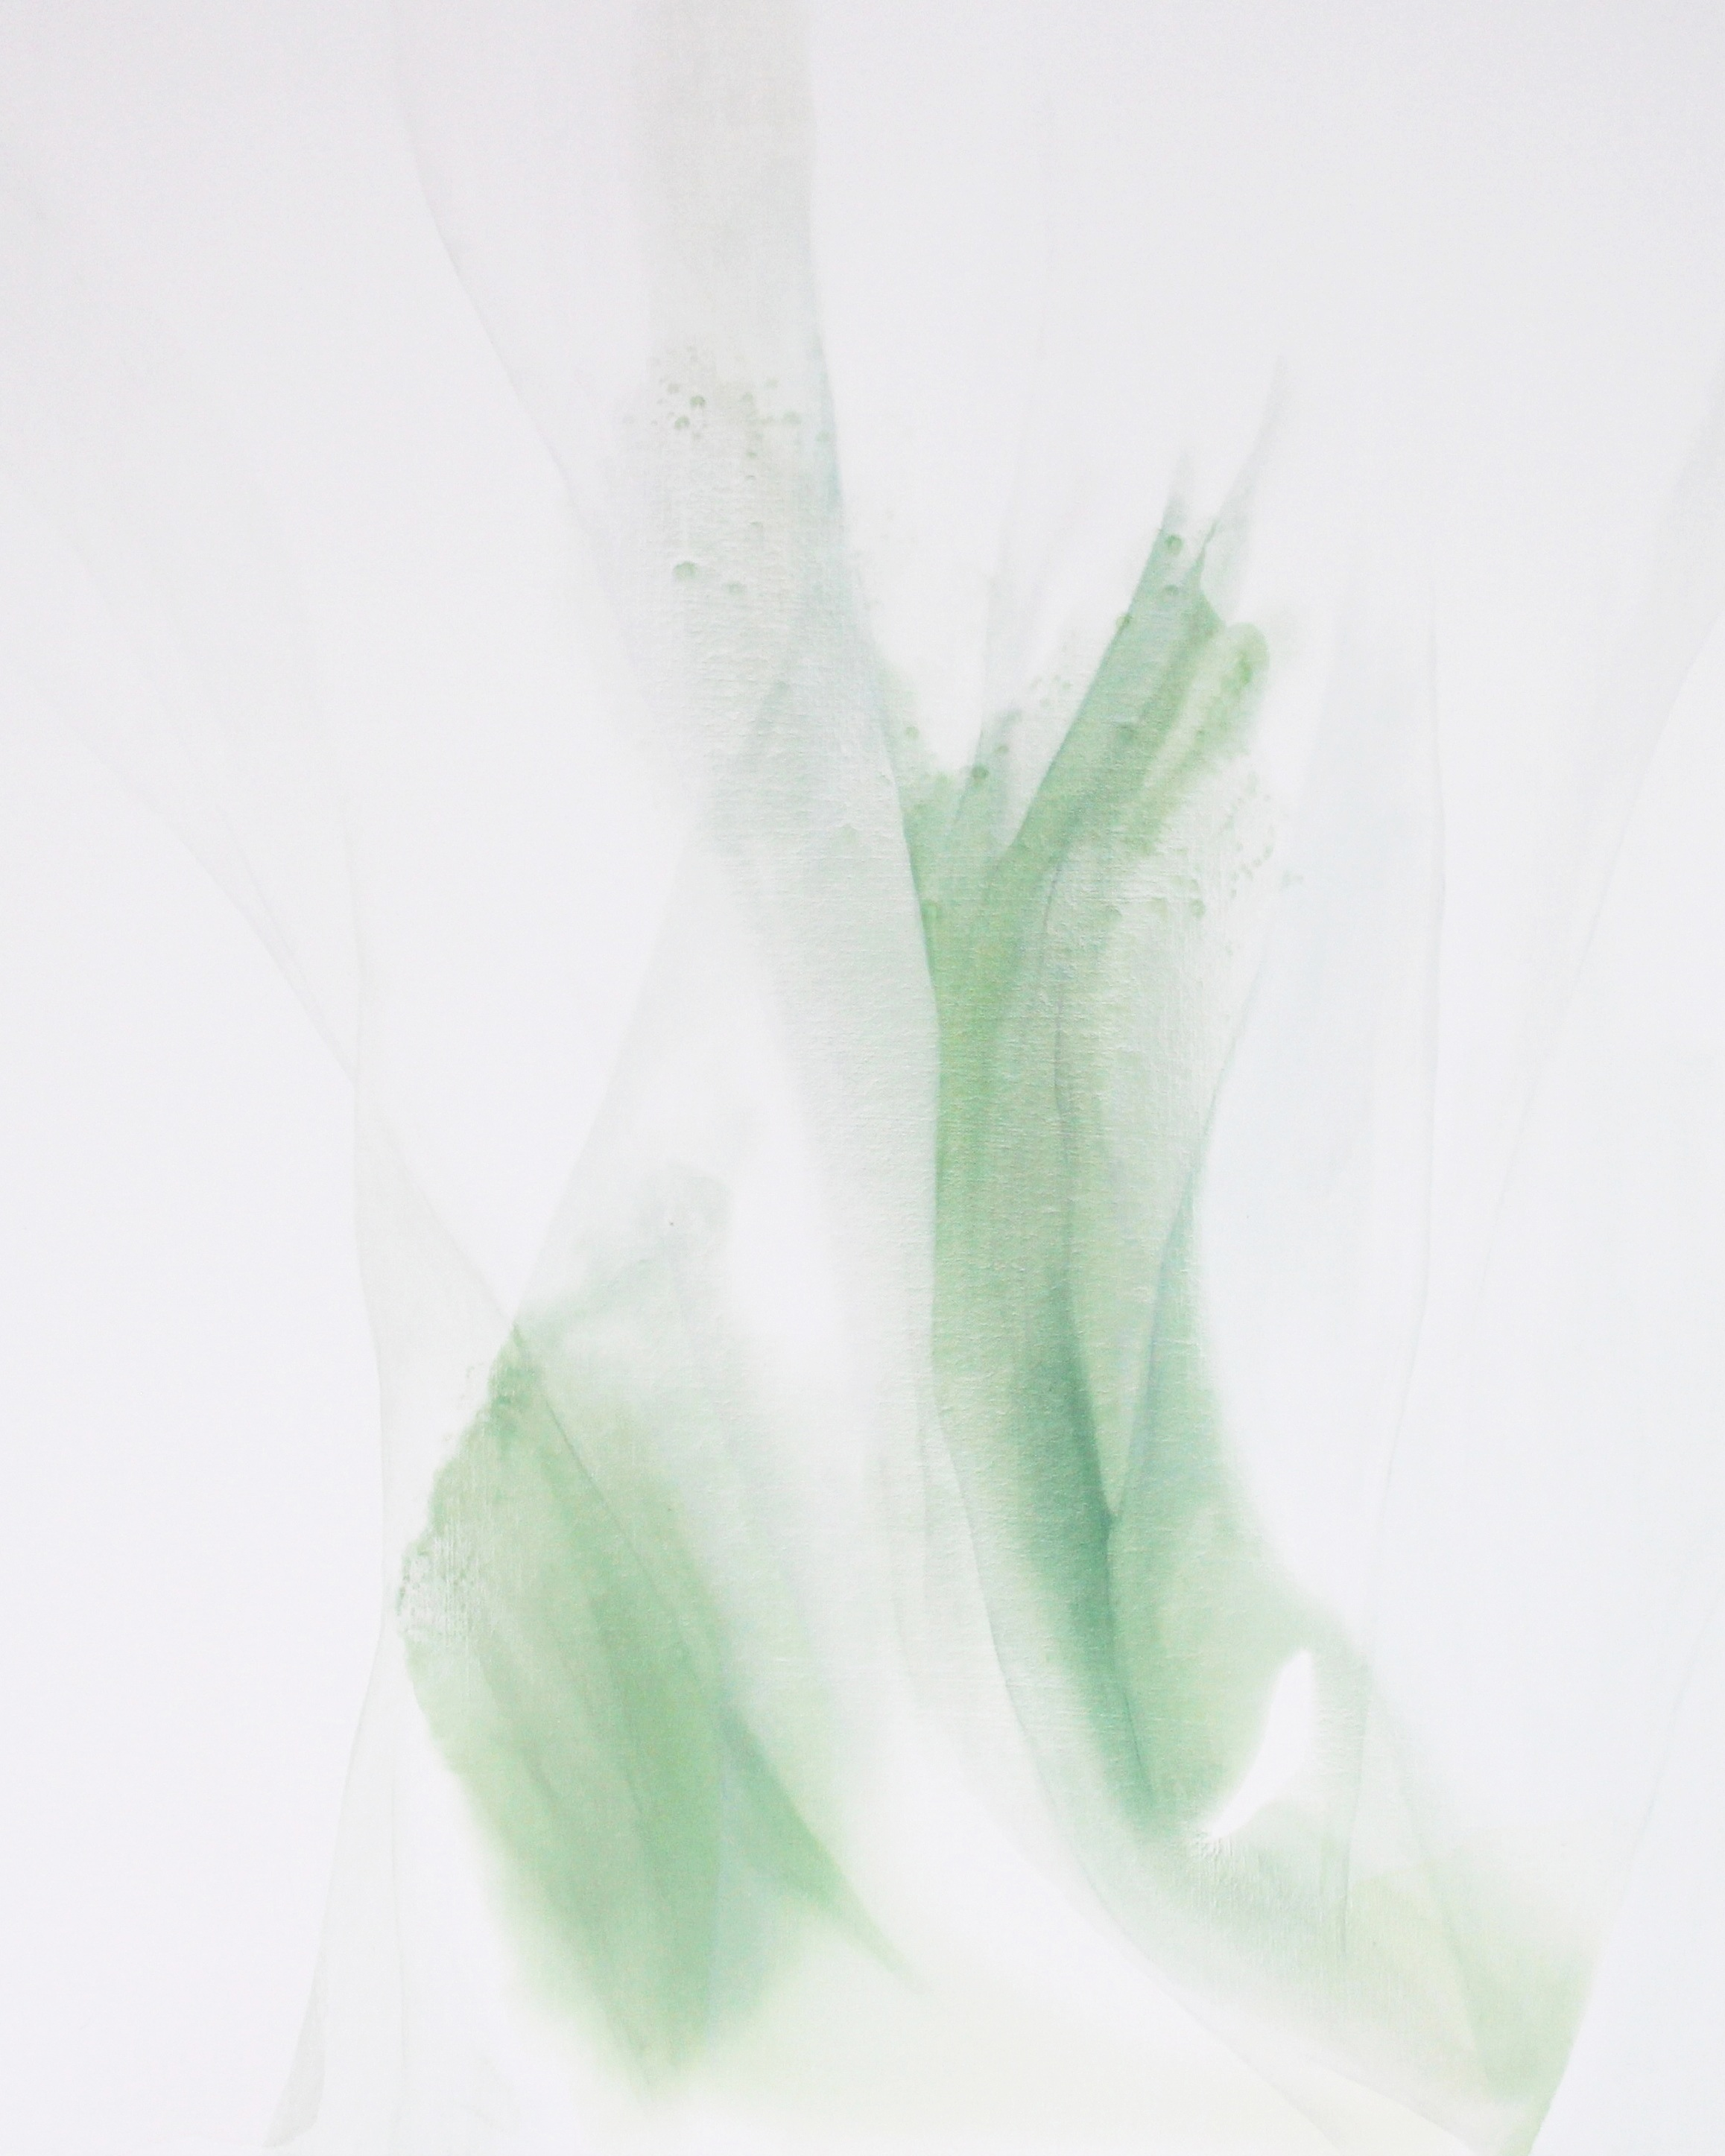 ephemeral_02  oil on canvas  80 X 100 cm  2017